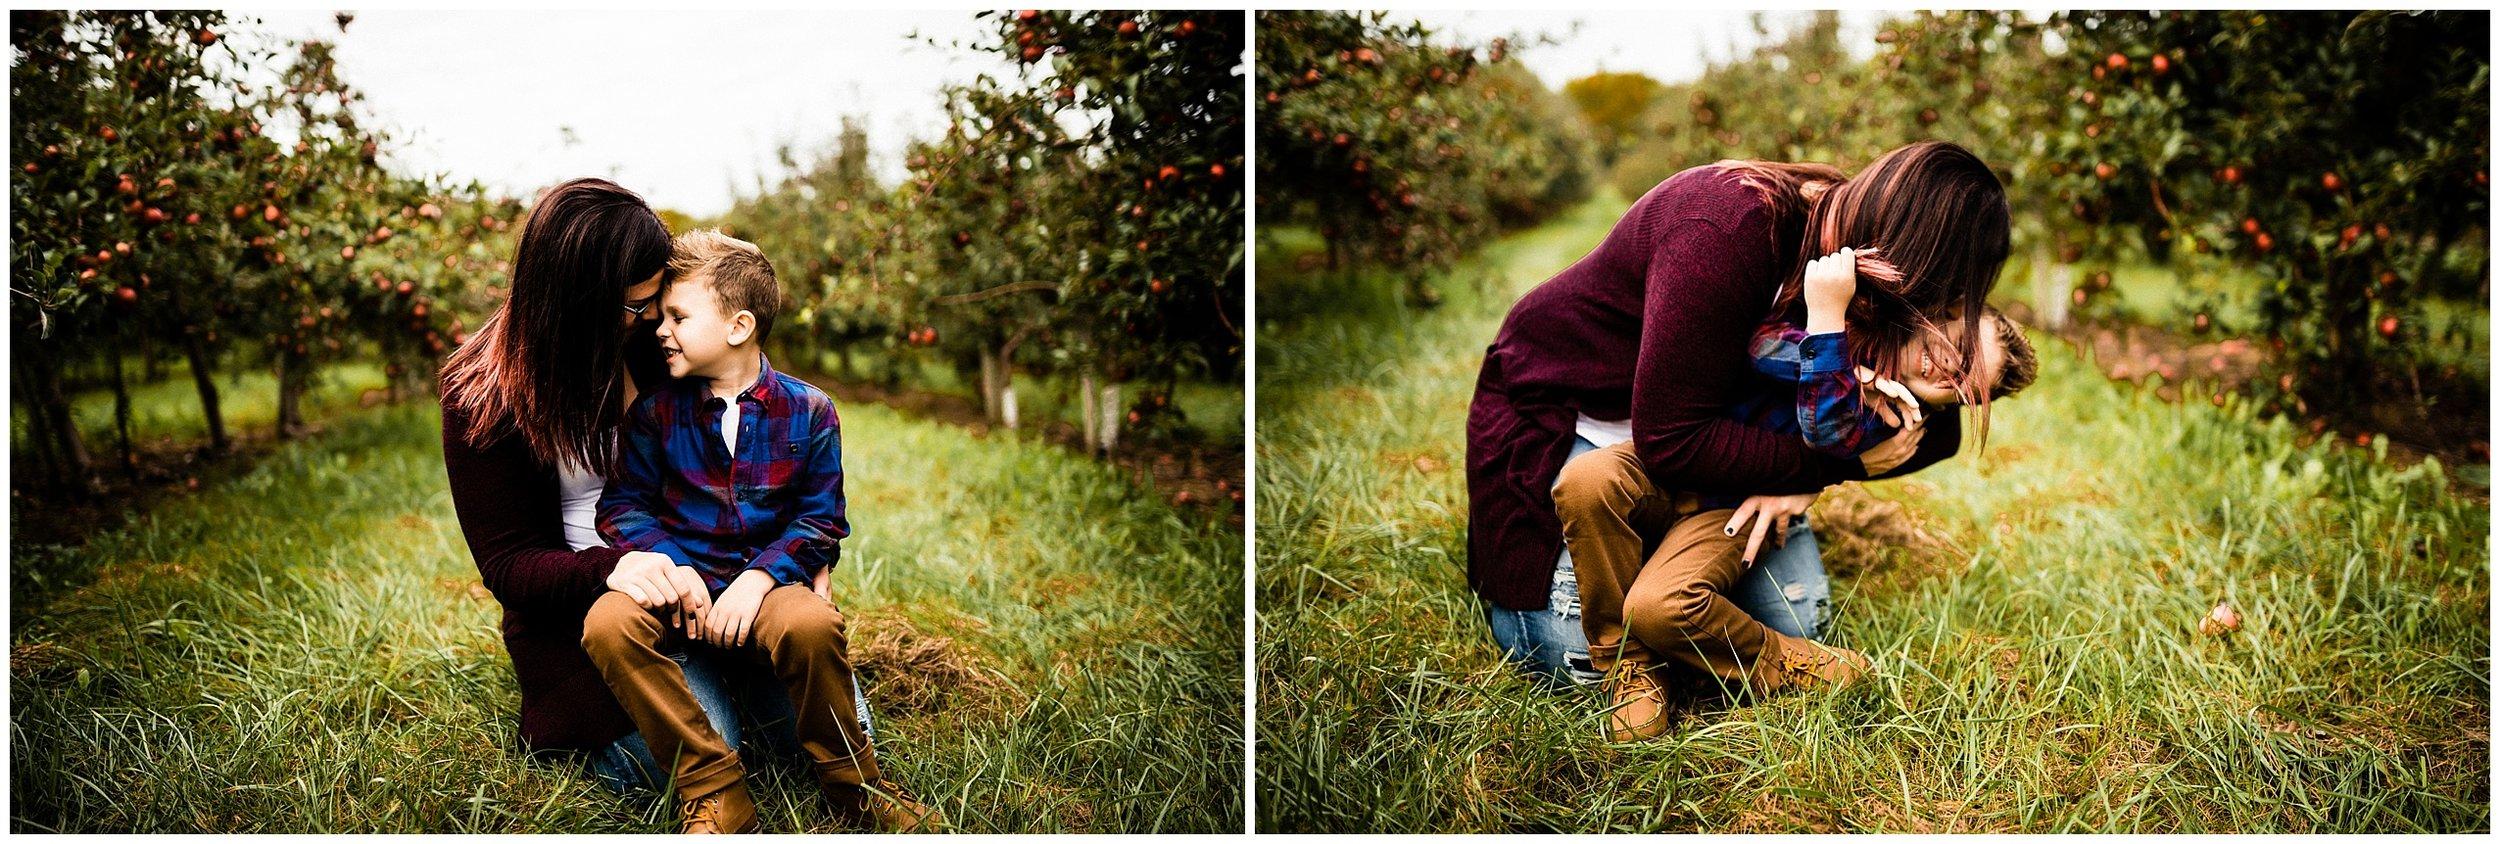 Kylee + Nolan #kyleepaigephotography_1545.jpg